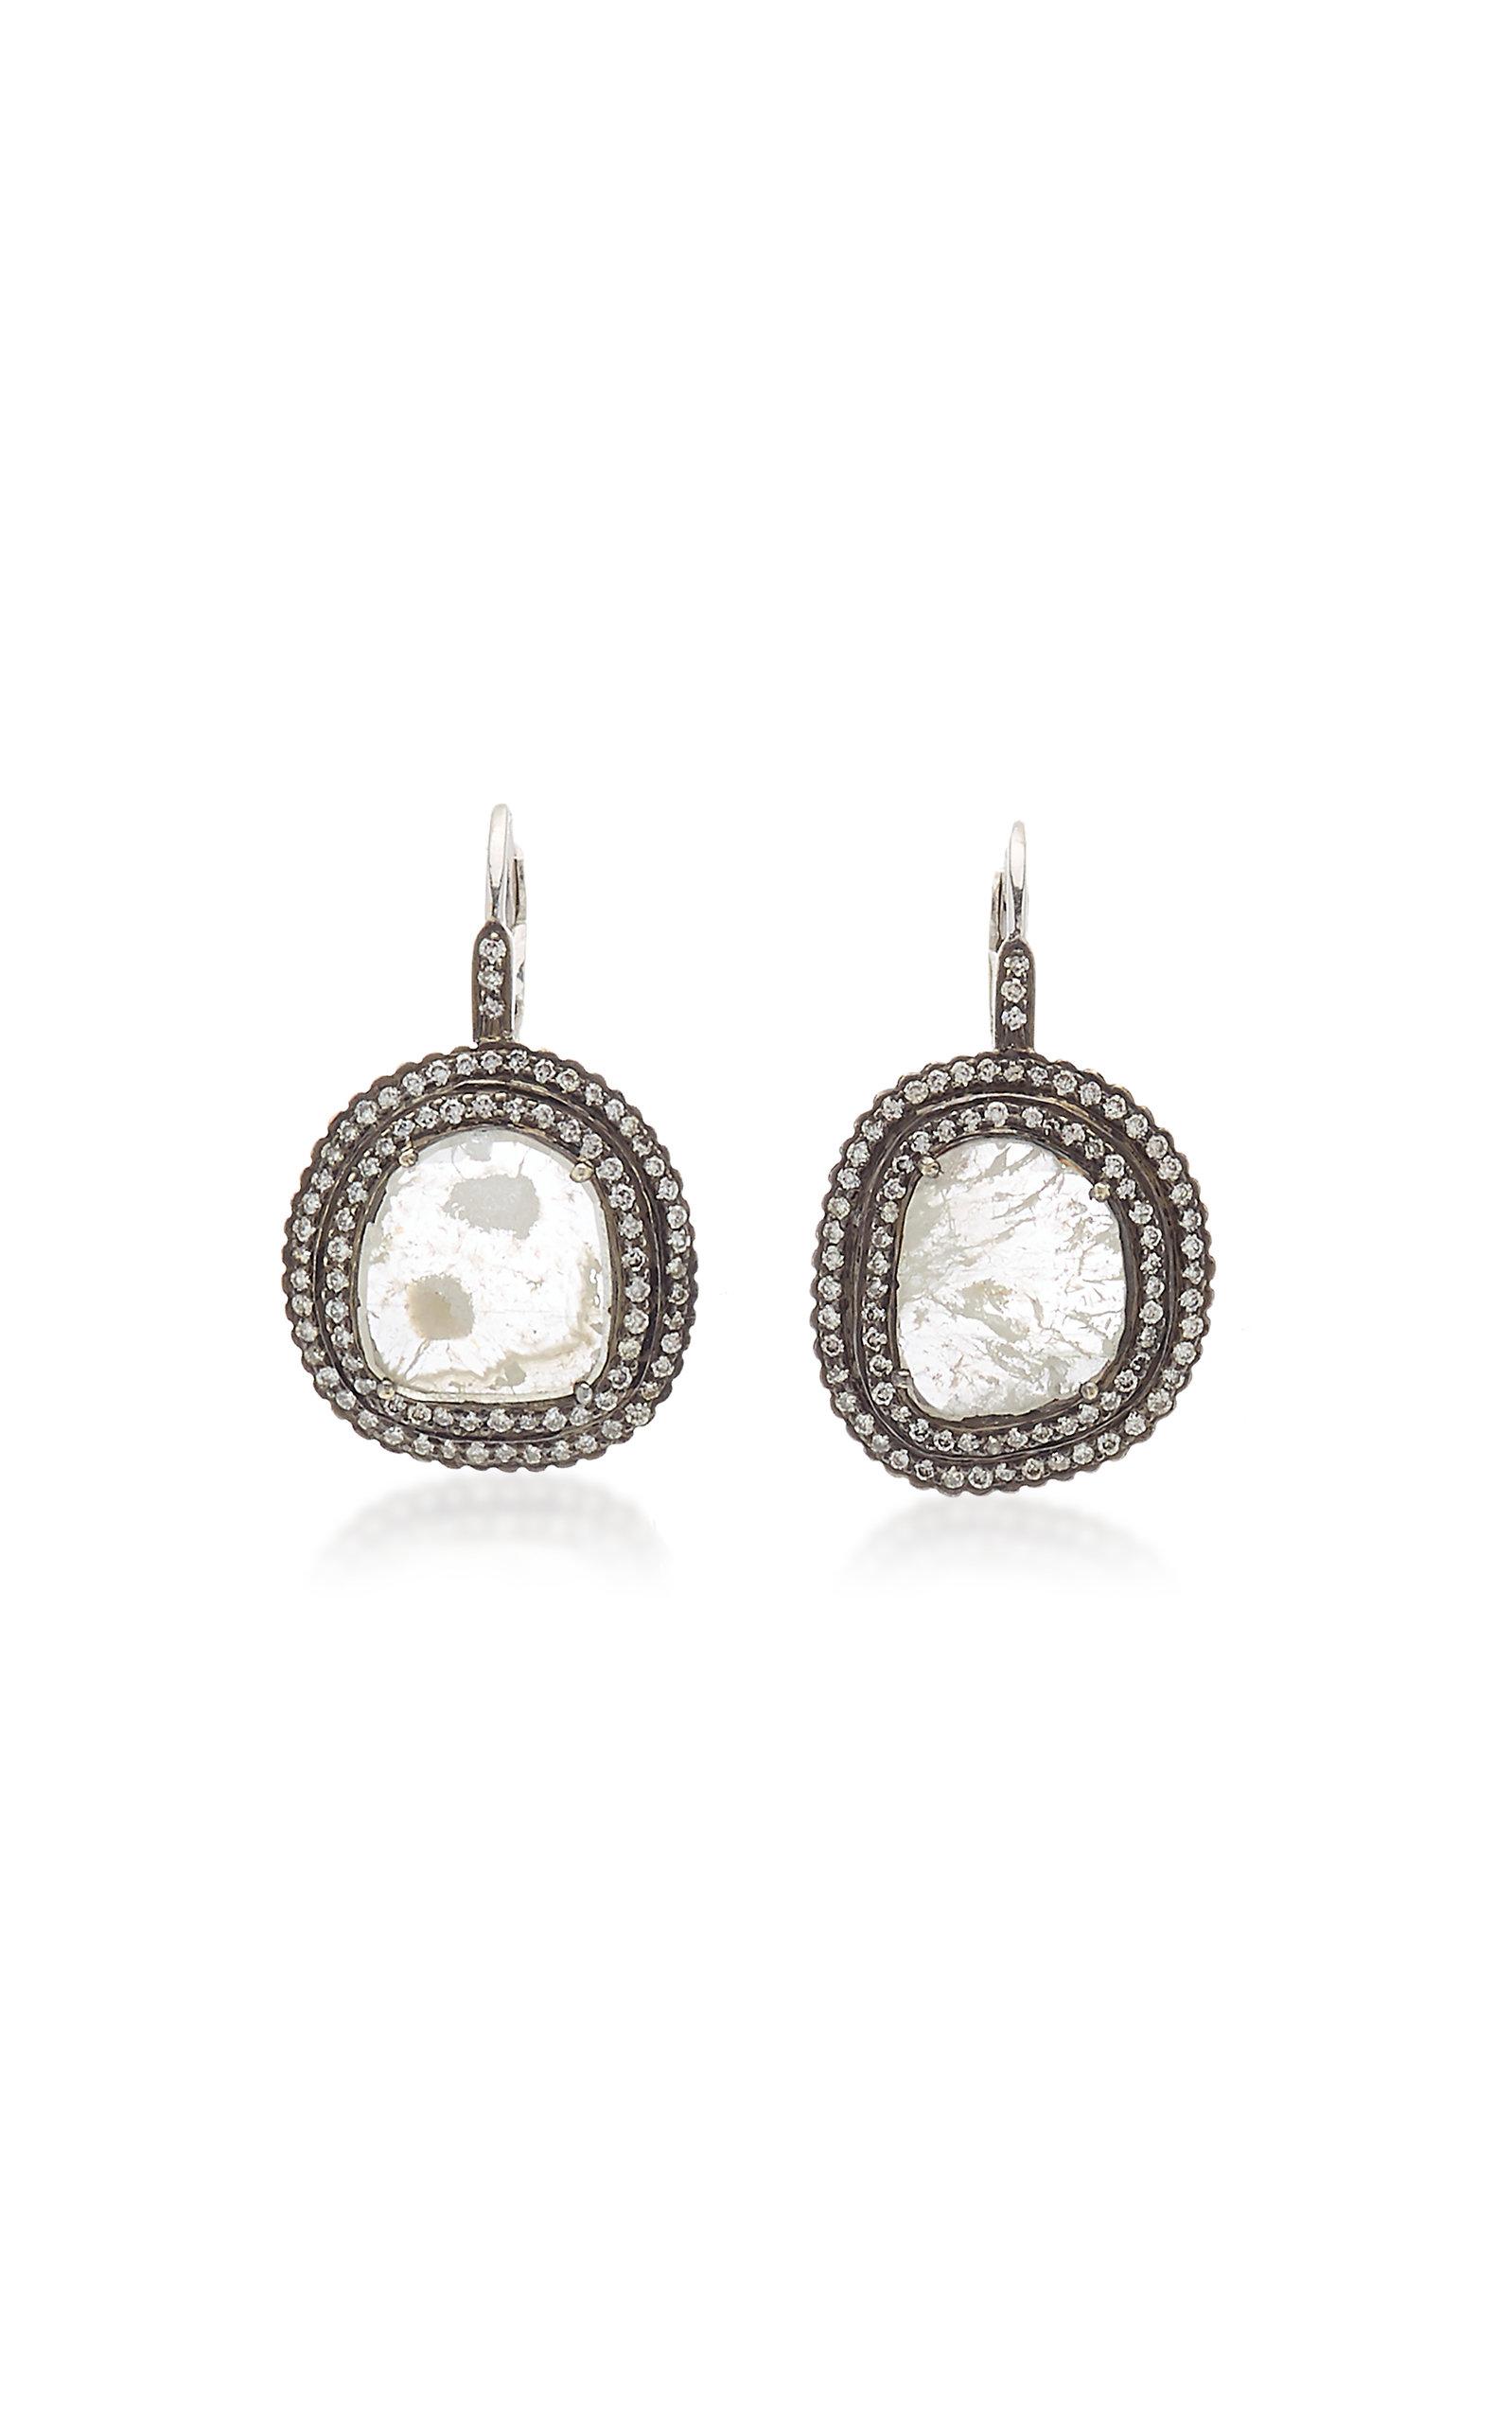 Women's Victorian 18K White Gold Diamond Earrings